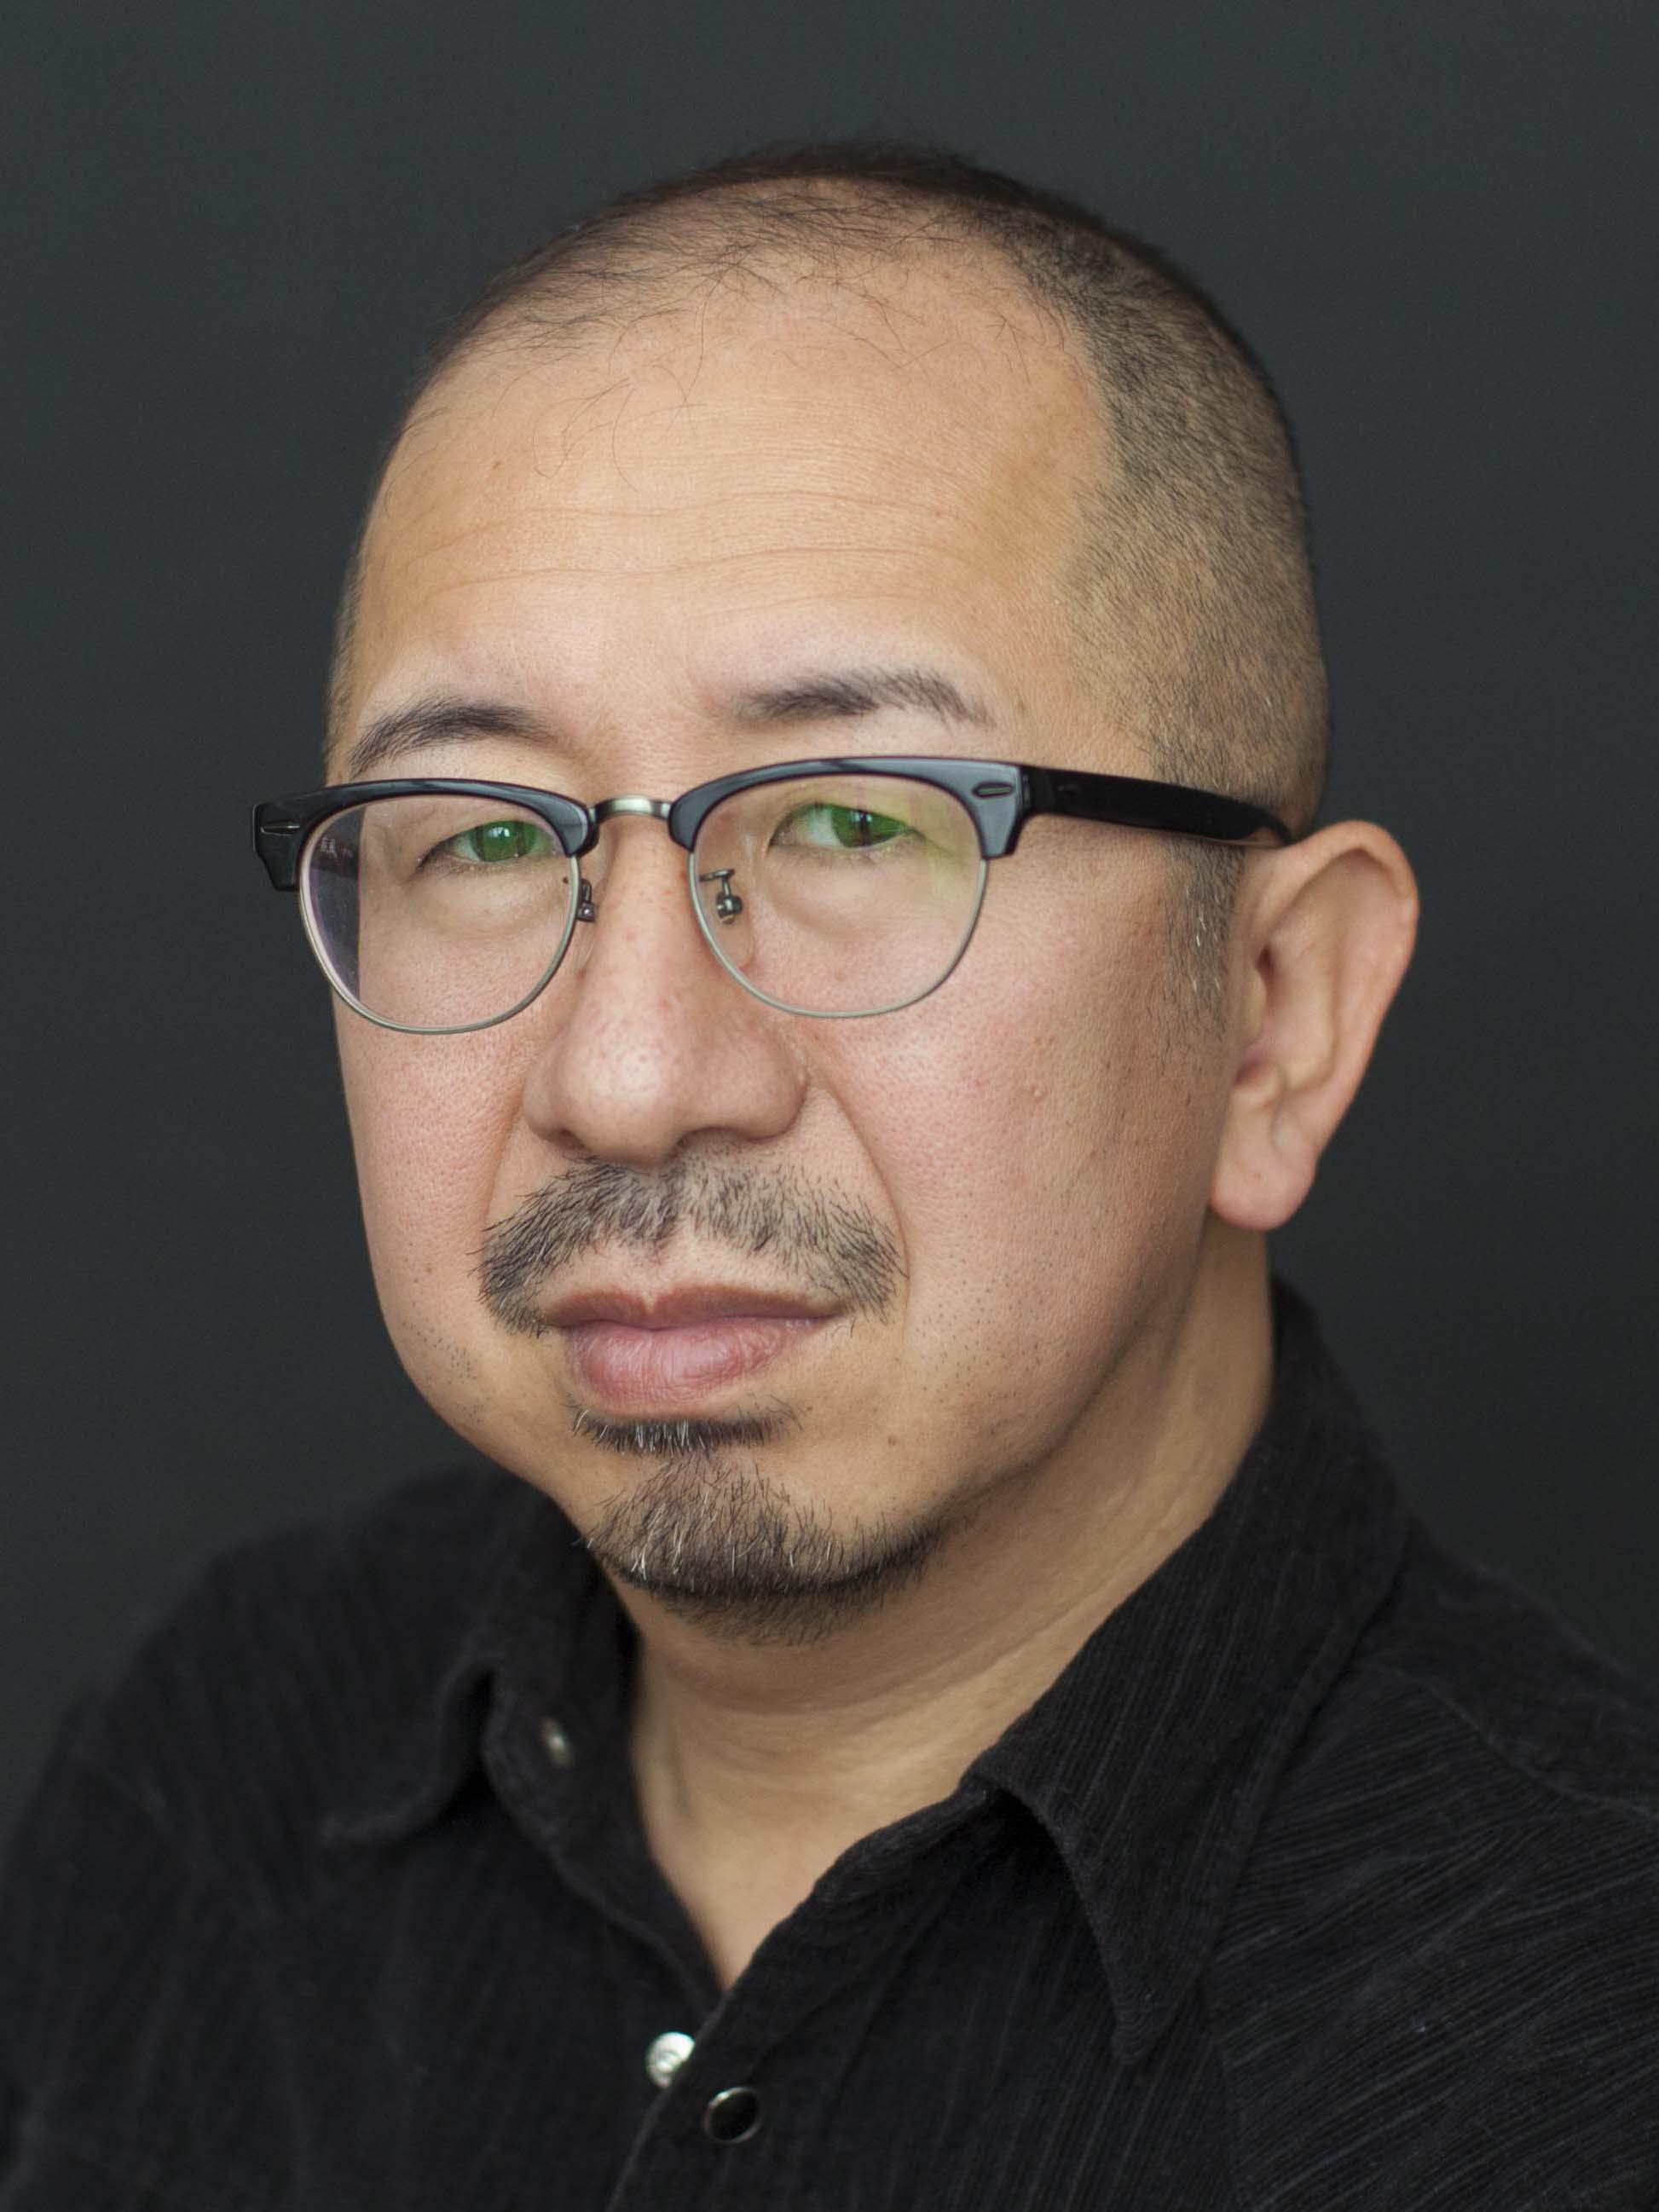 yukihiro yoshihara